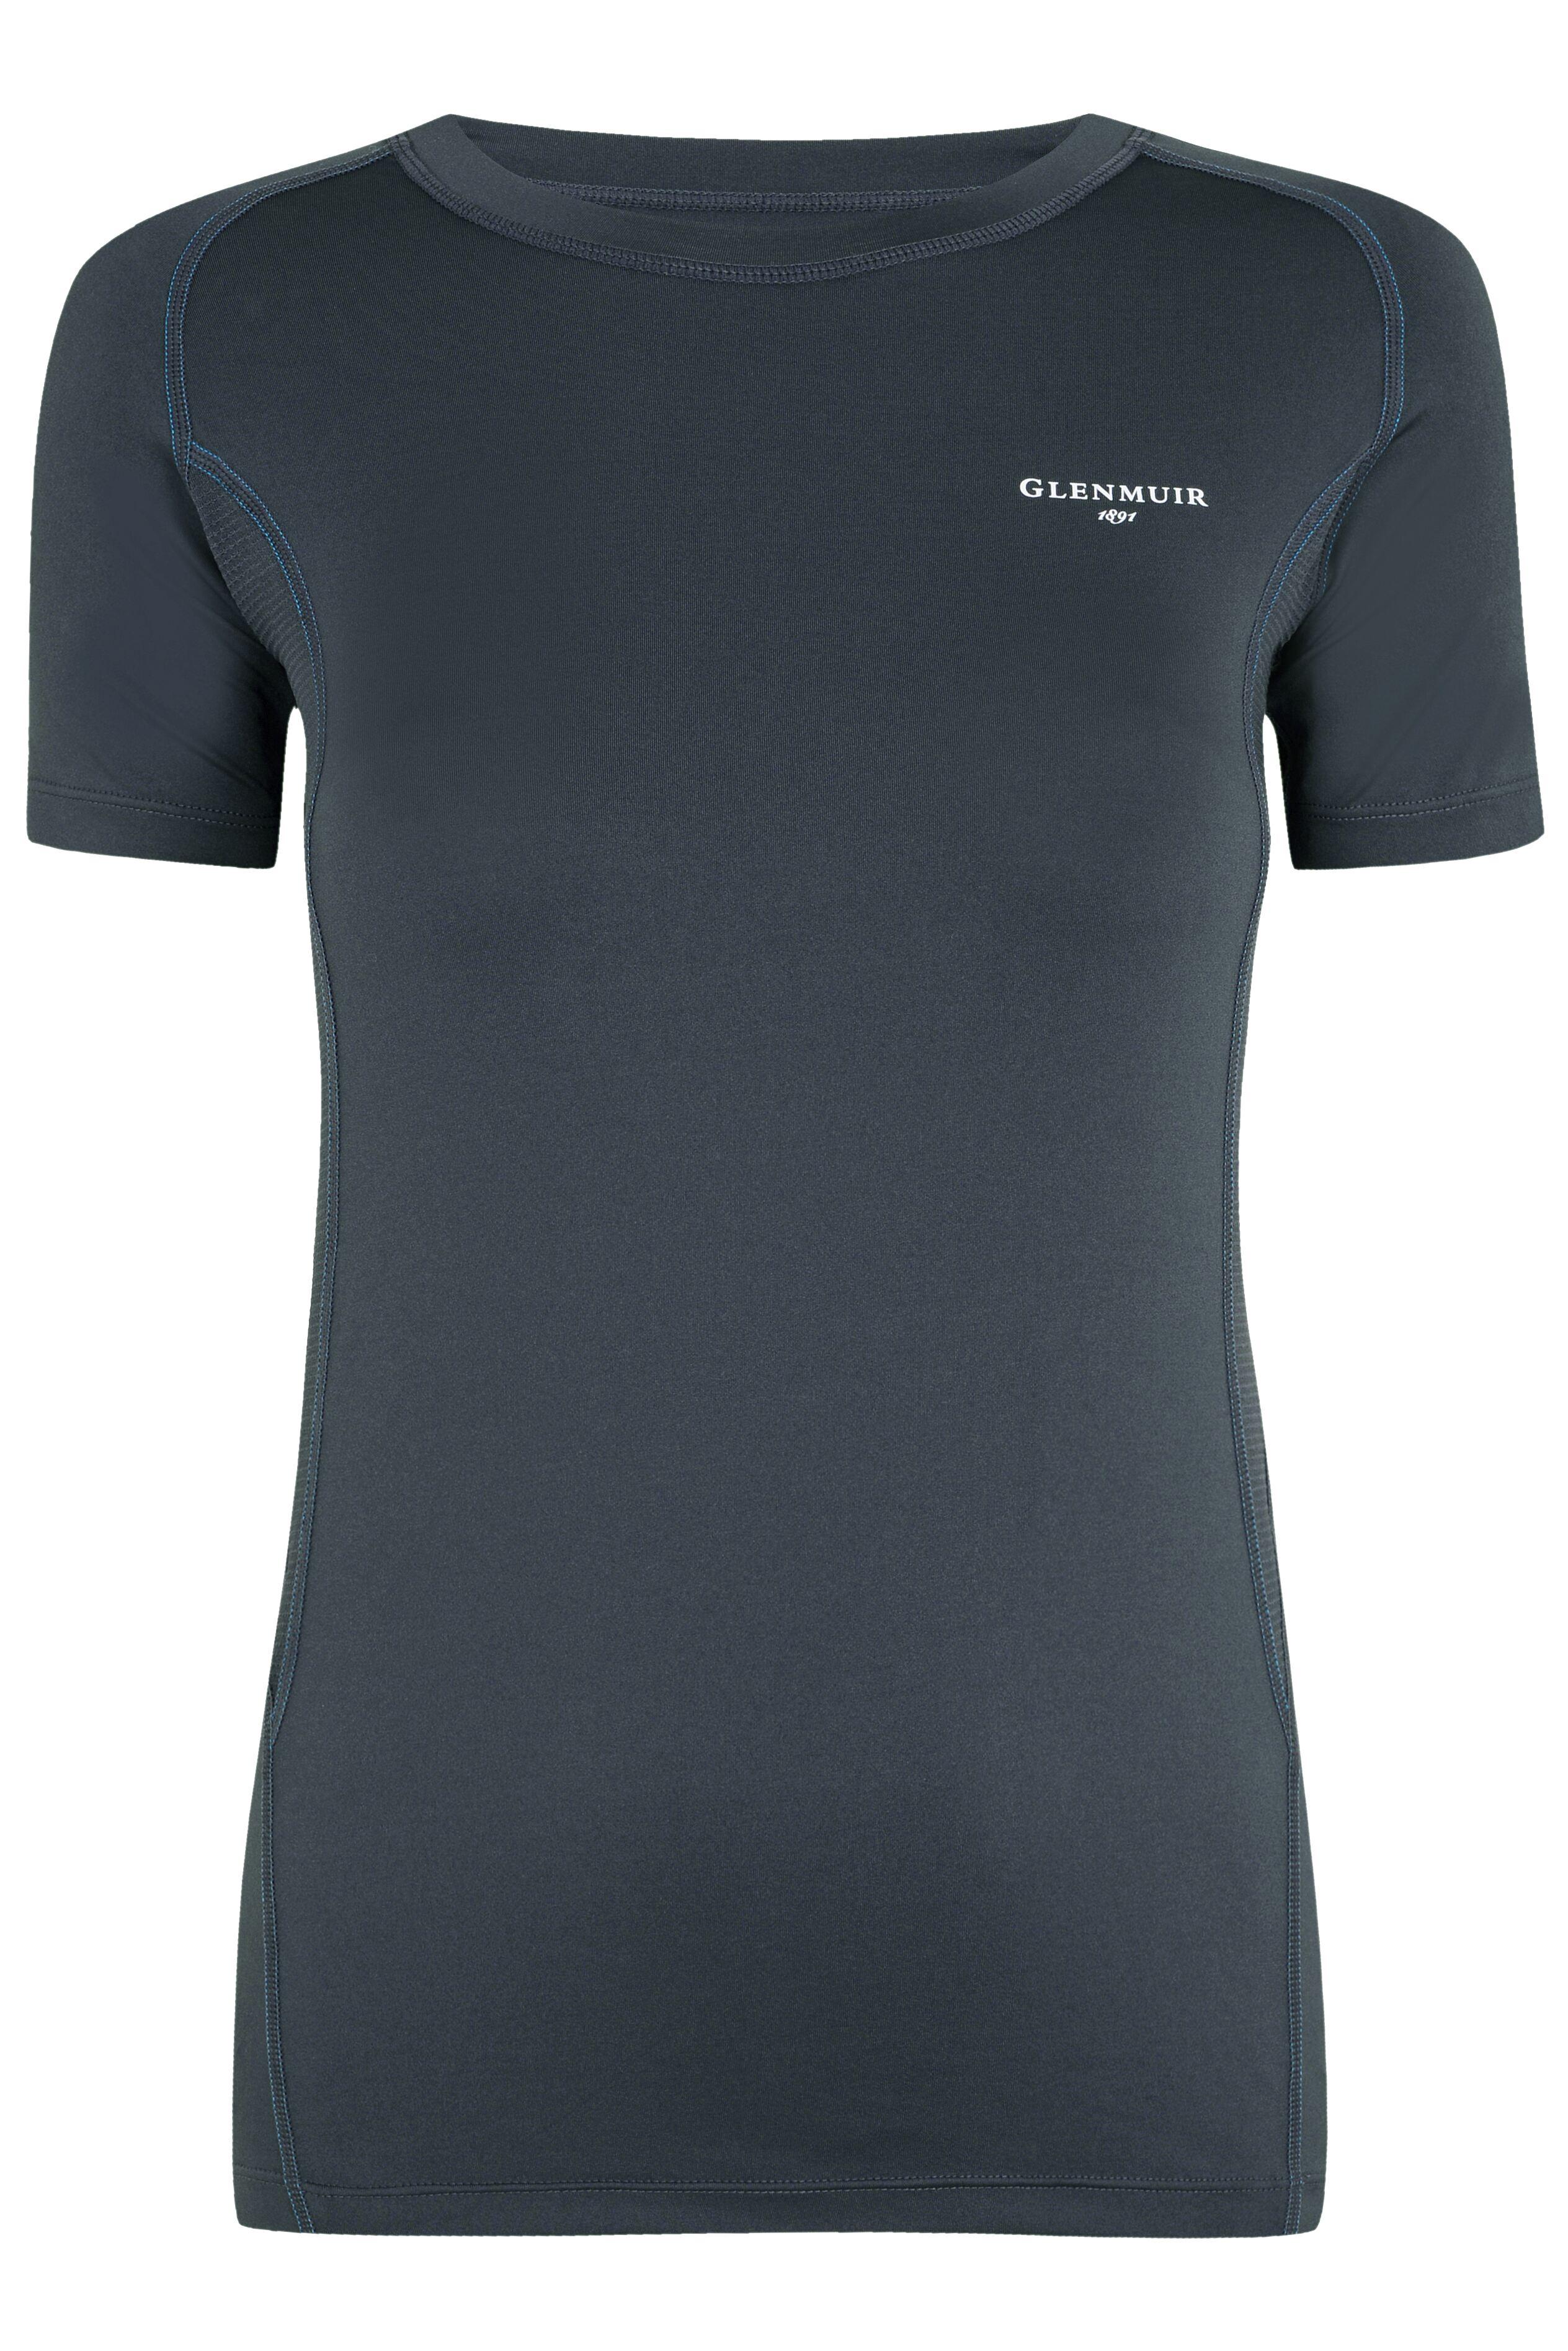 Image of 1 Pack Grey Short Sleeved Compression Base Layer T-Shirt Ladies 10-12 Ladies - Glenmuir